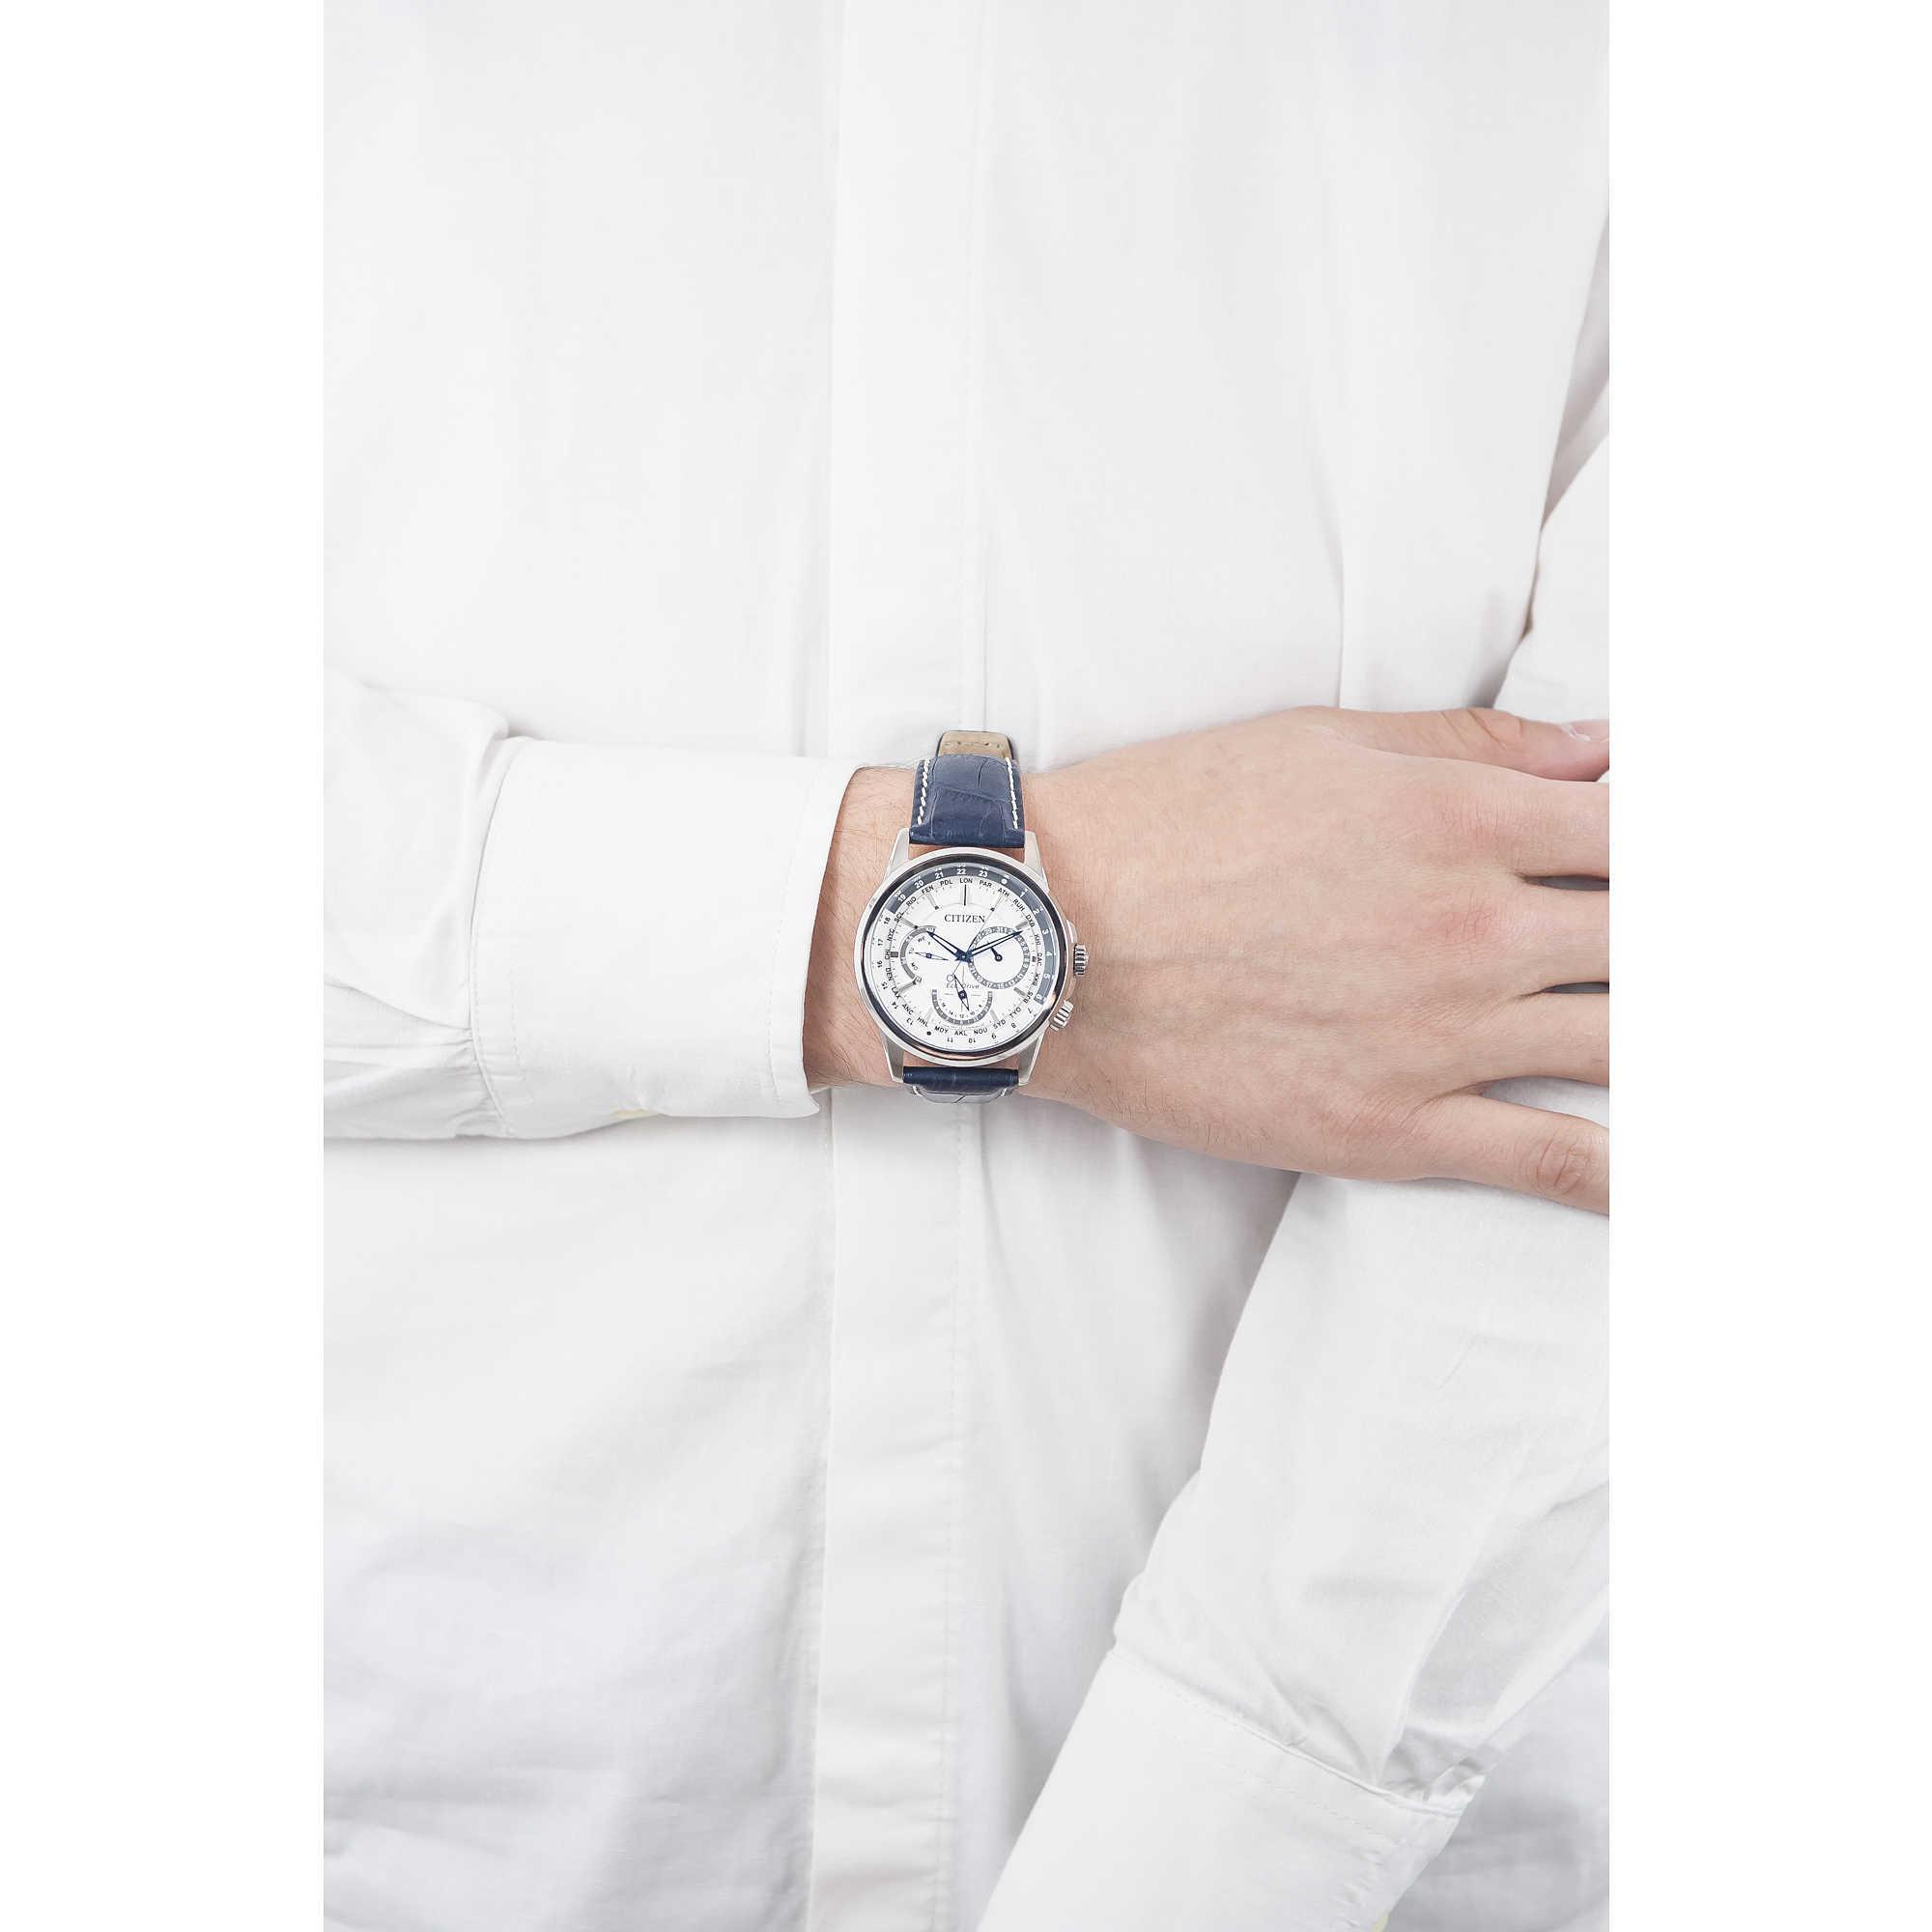 Watch Chronograph Man Citizen Calendrier Bu2020 11a Chronographs Ca4285 50h Zoom